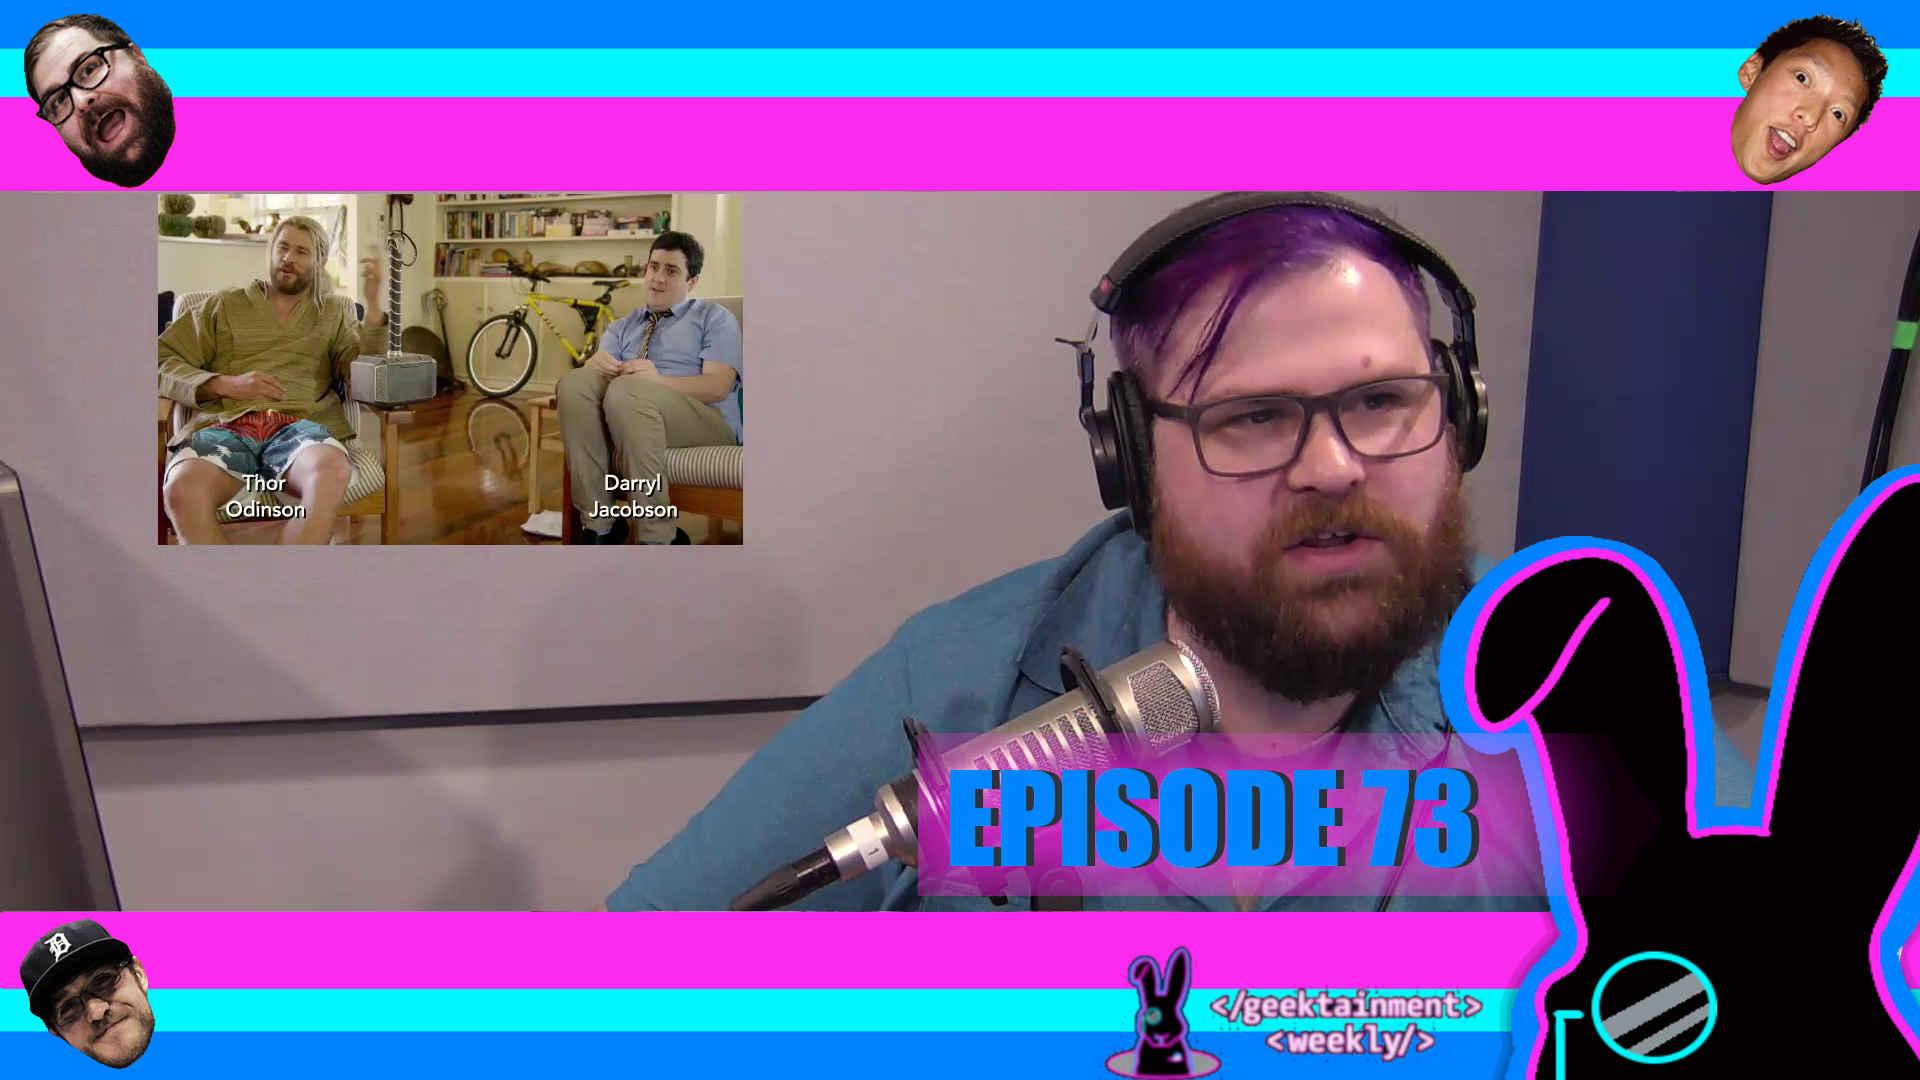 Geektainment Weekly - Episode 73